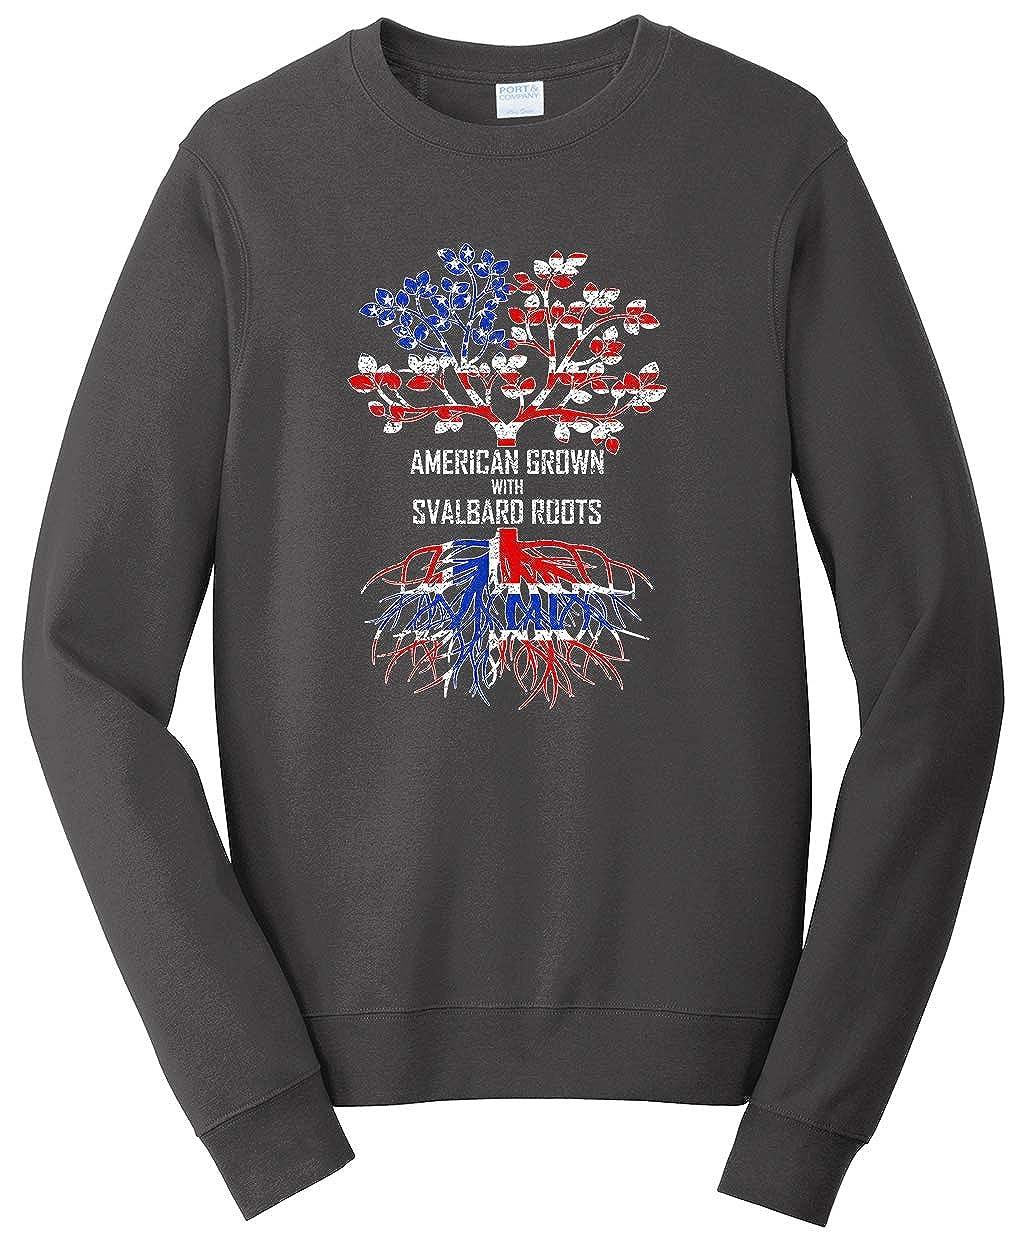 Tenacitee Unisex American Grown with Svalbard Roots Sweatshirt